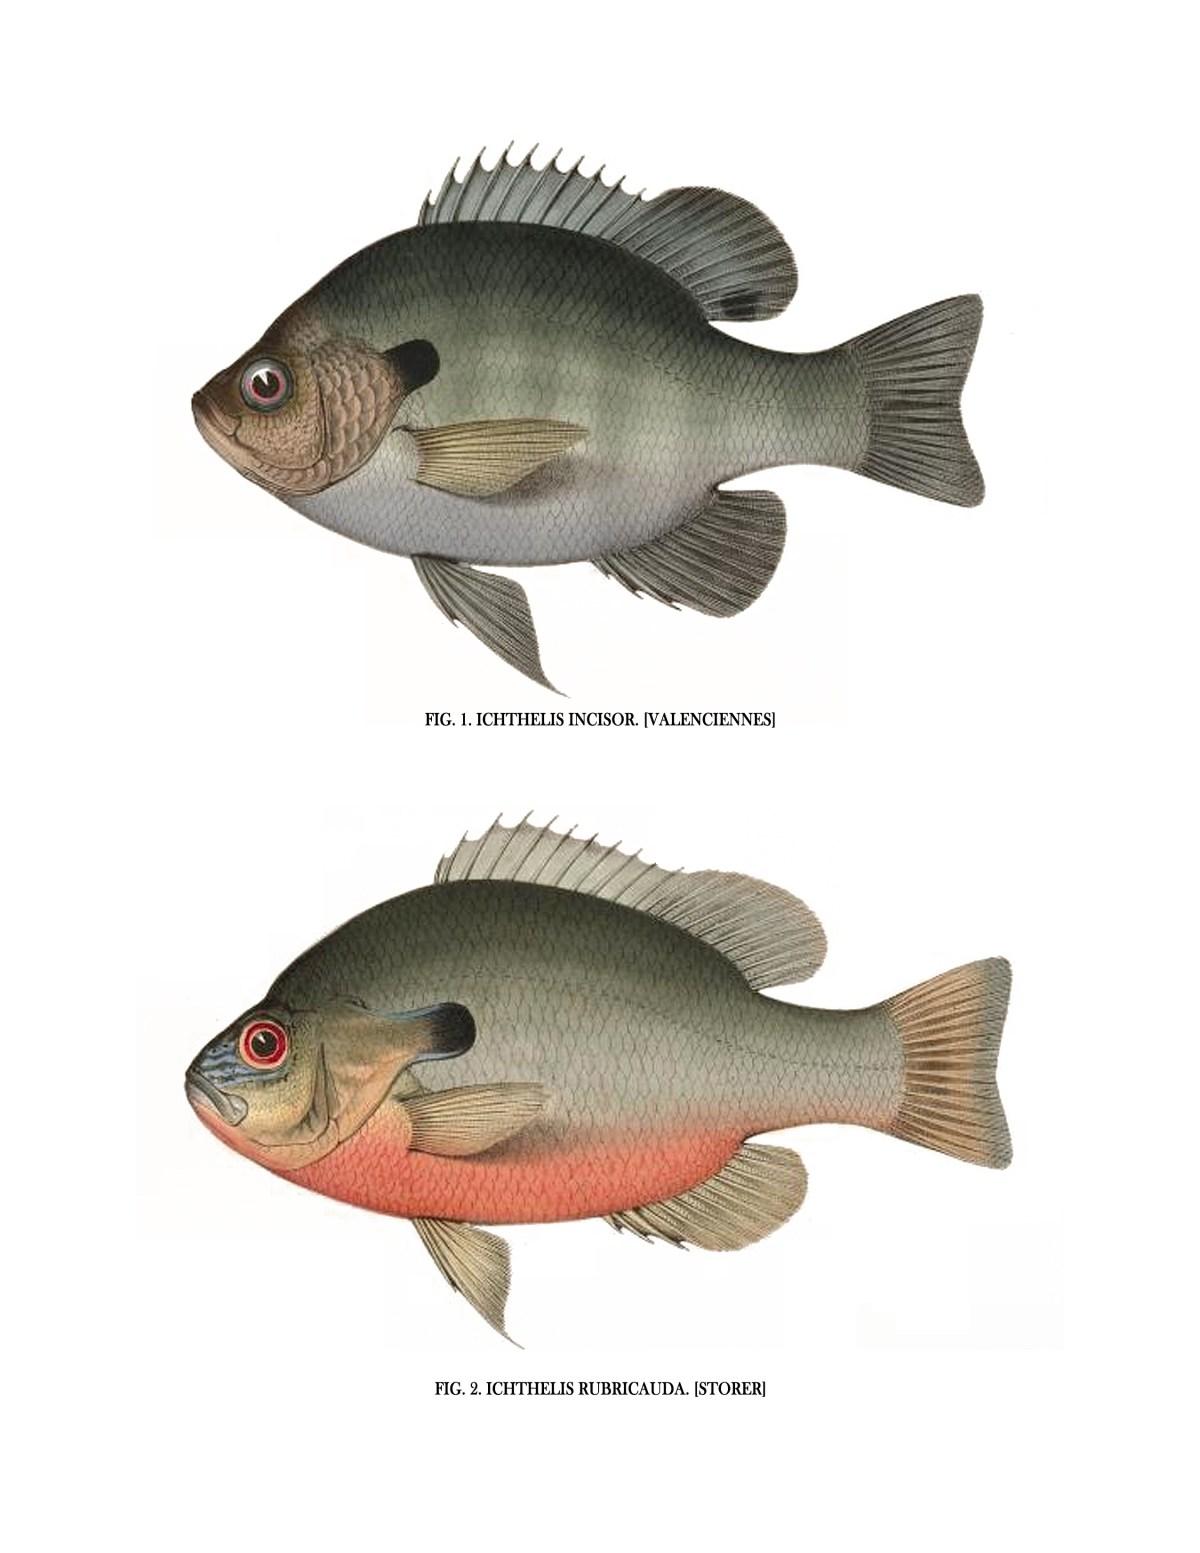 Vintage Fish Wall Art - Set of 4Vintage Fish Wall Art - Set of 4